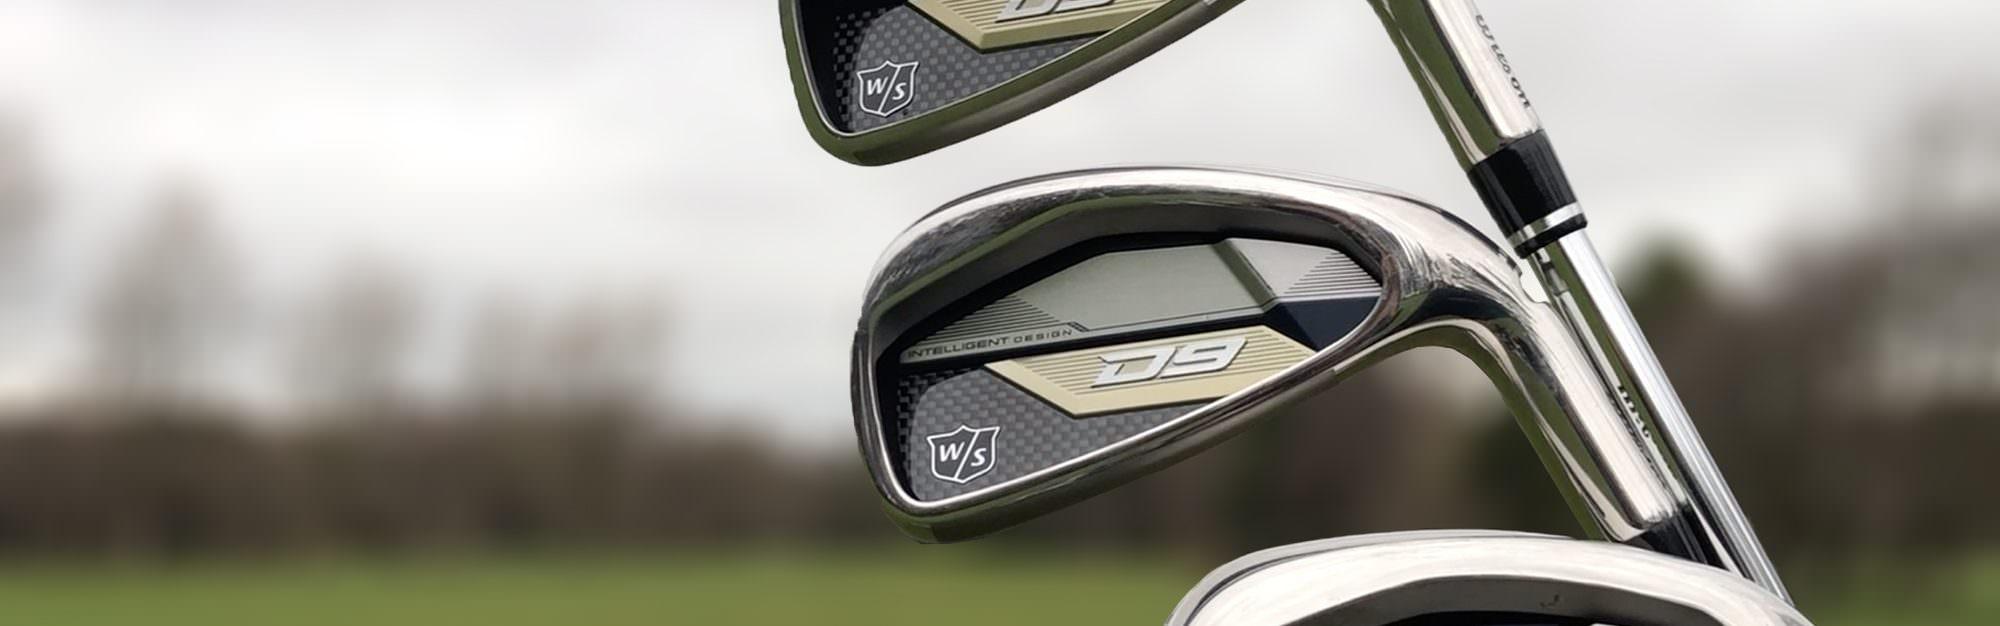 WIN: A brand new set of Wilson D9 irons!